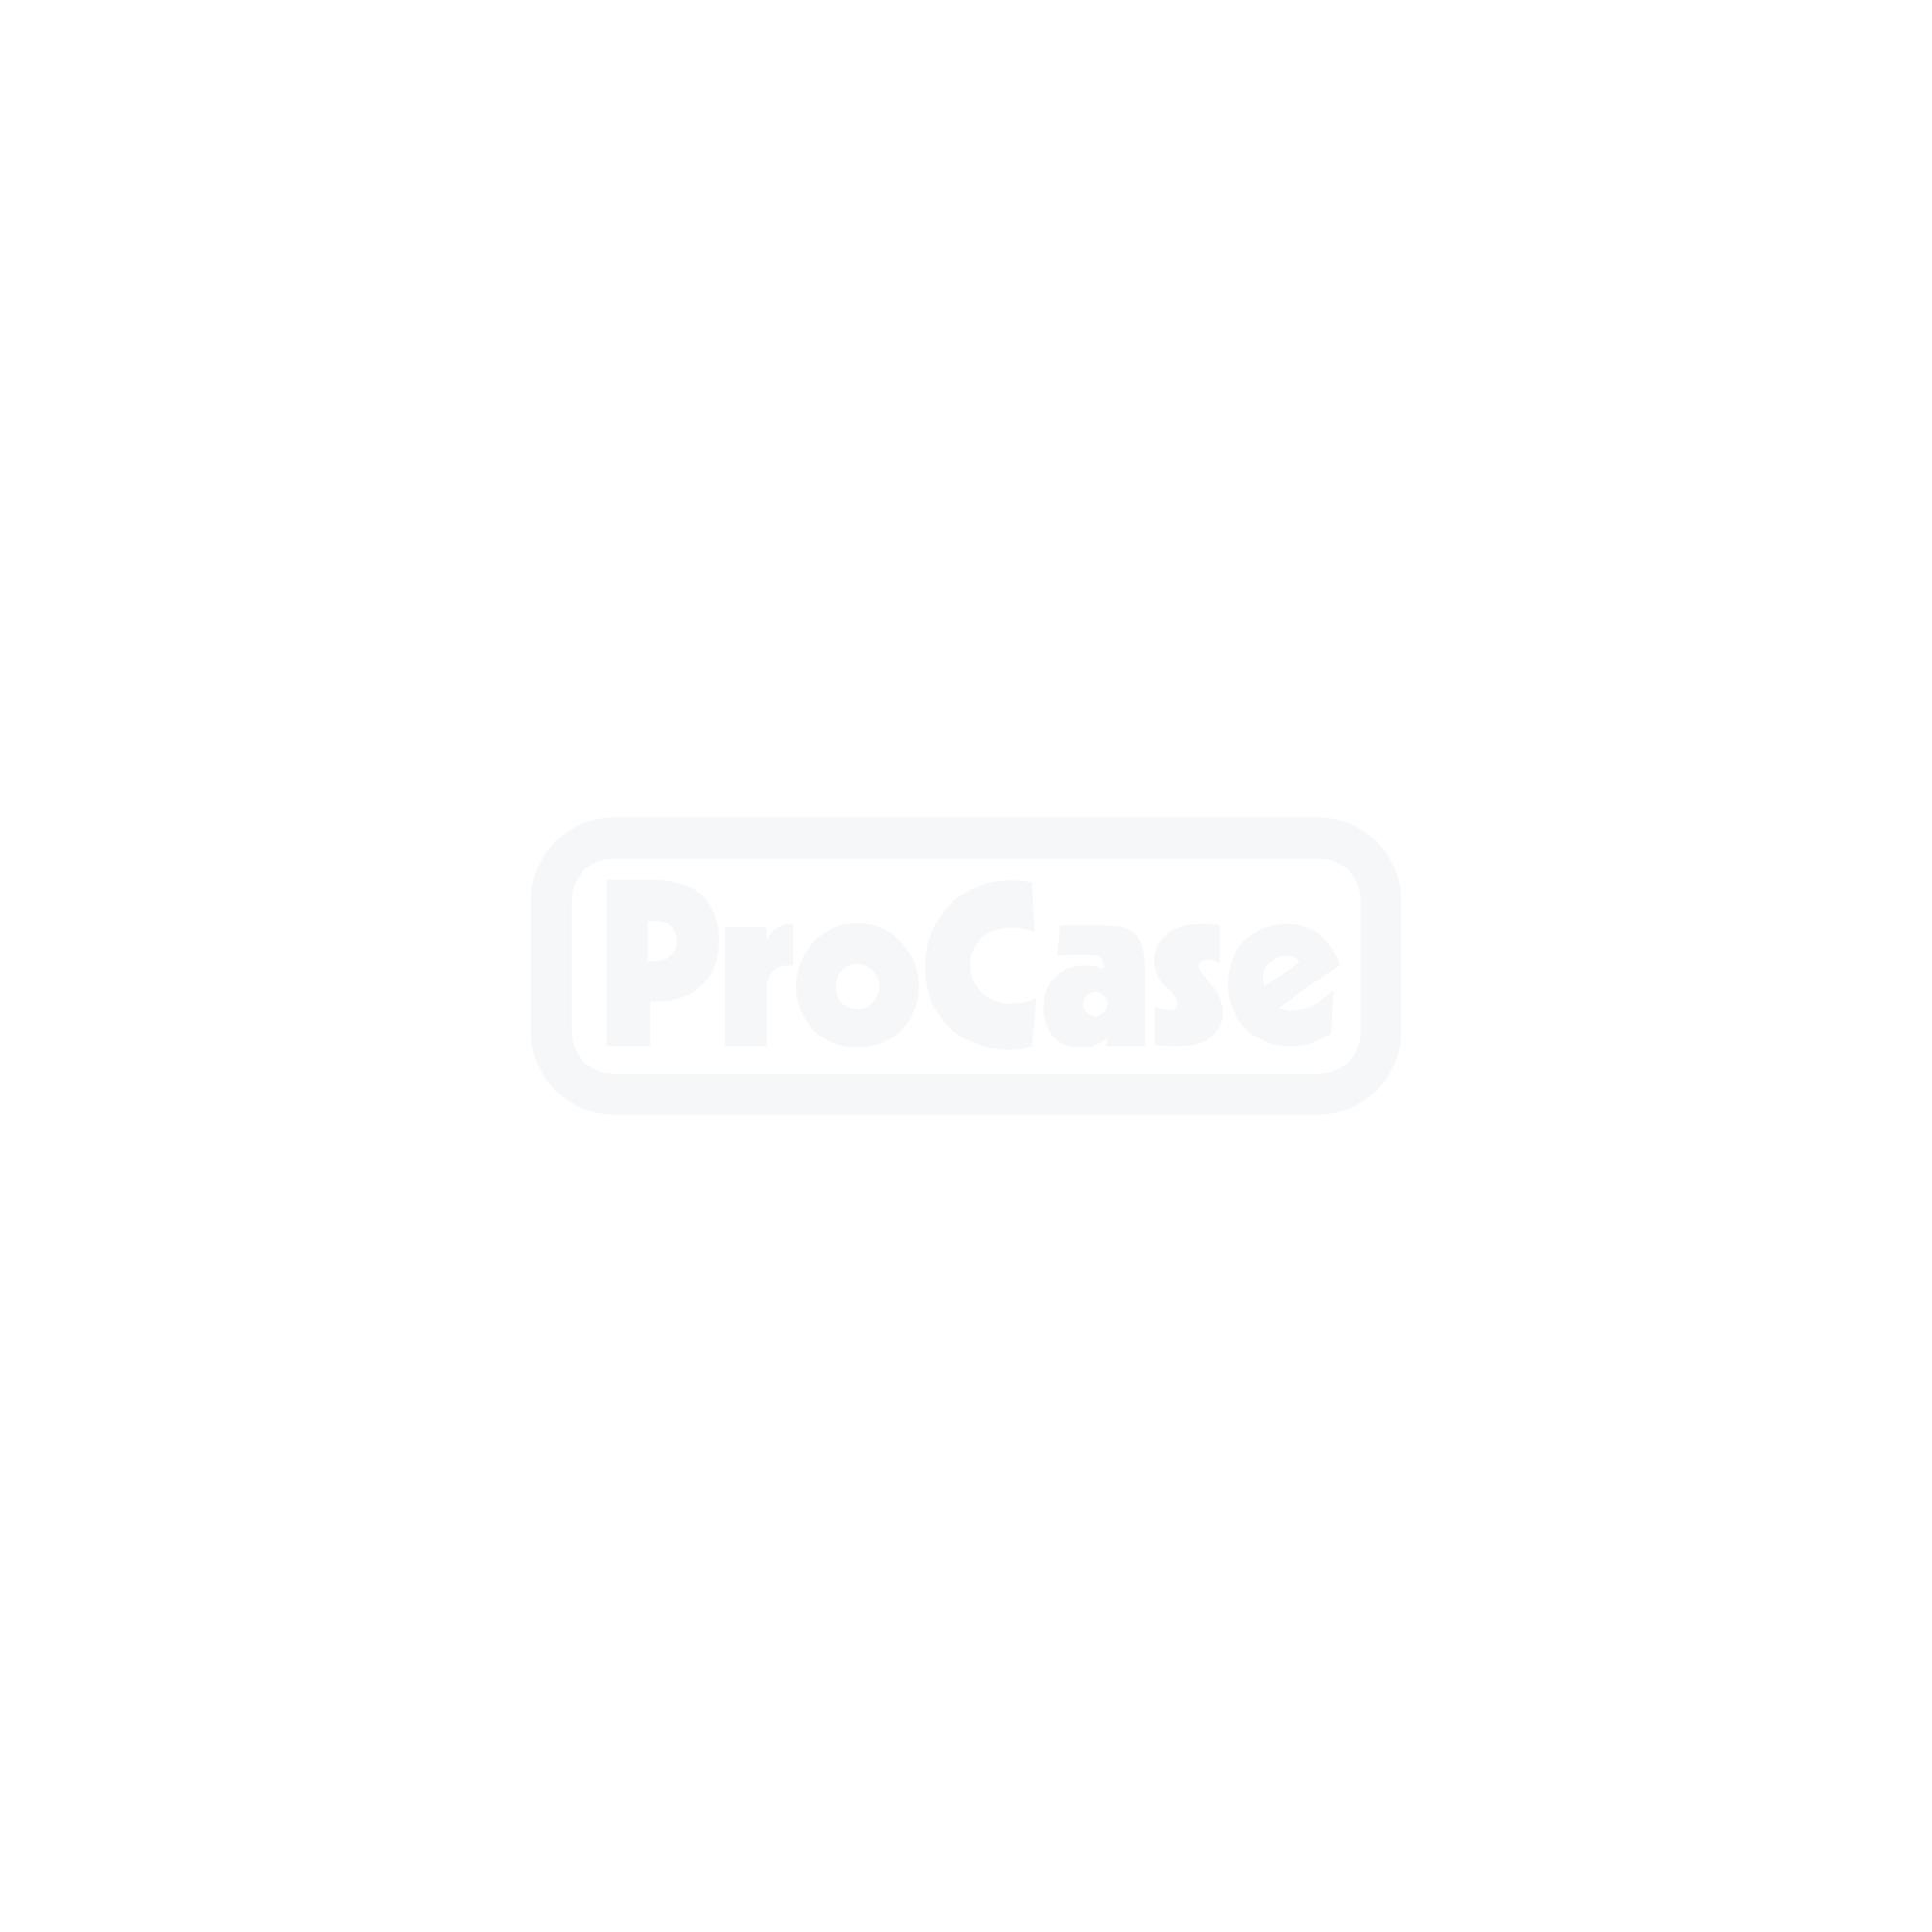 Flightcase für Tridelity MV6500 Display 2